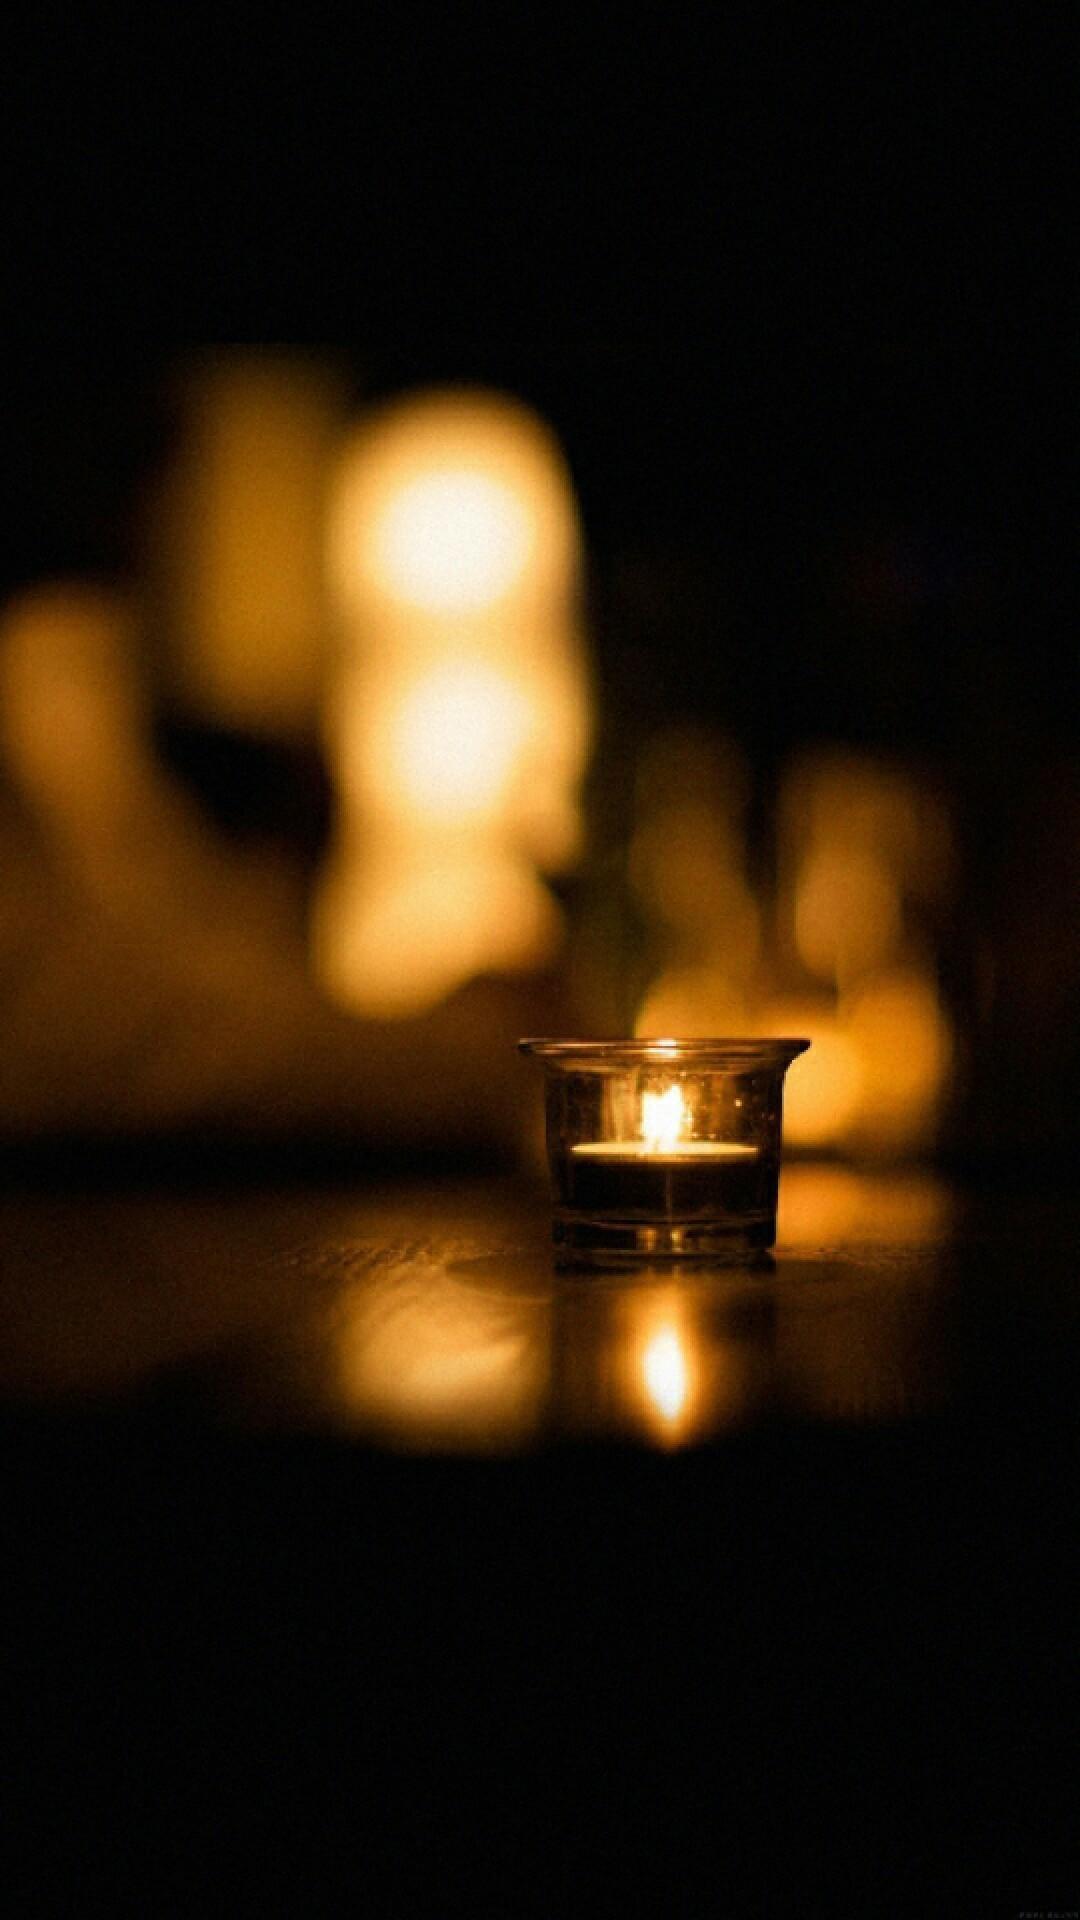 Candlelight cellphone wallpaper lock screen background – Christmas,  thanksgiving, winter, Autumn, Fall